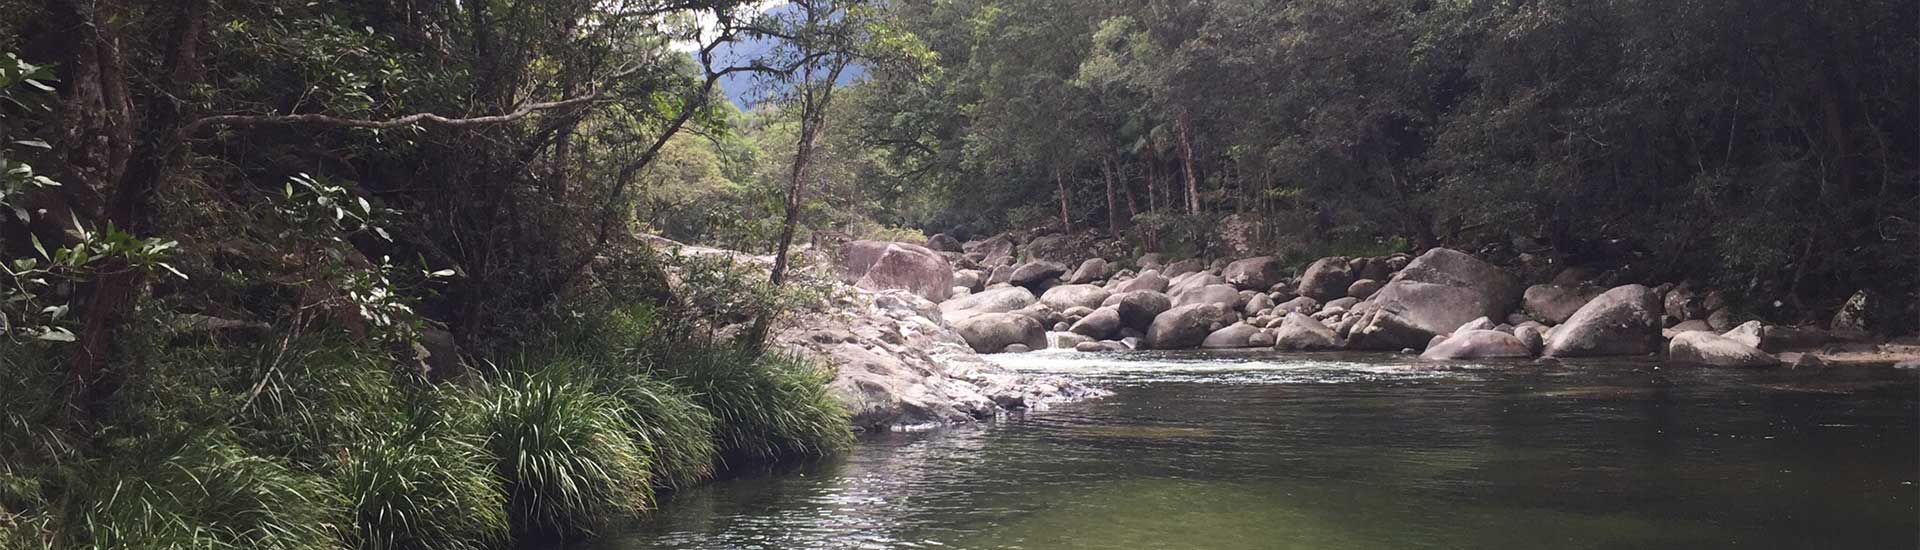 Mossman Gorge Daintree Forest